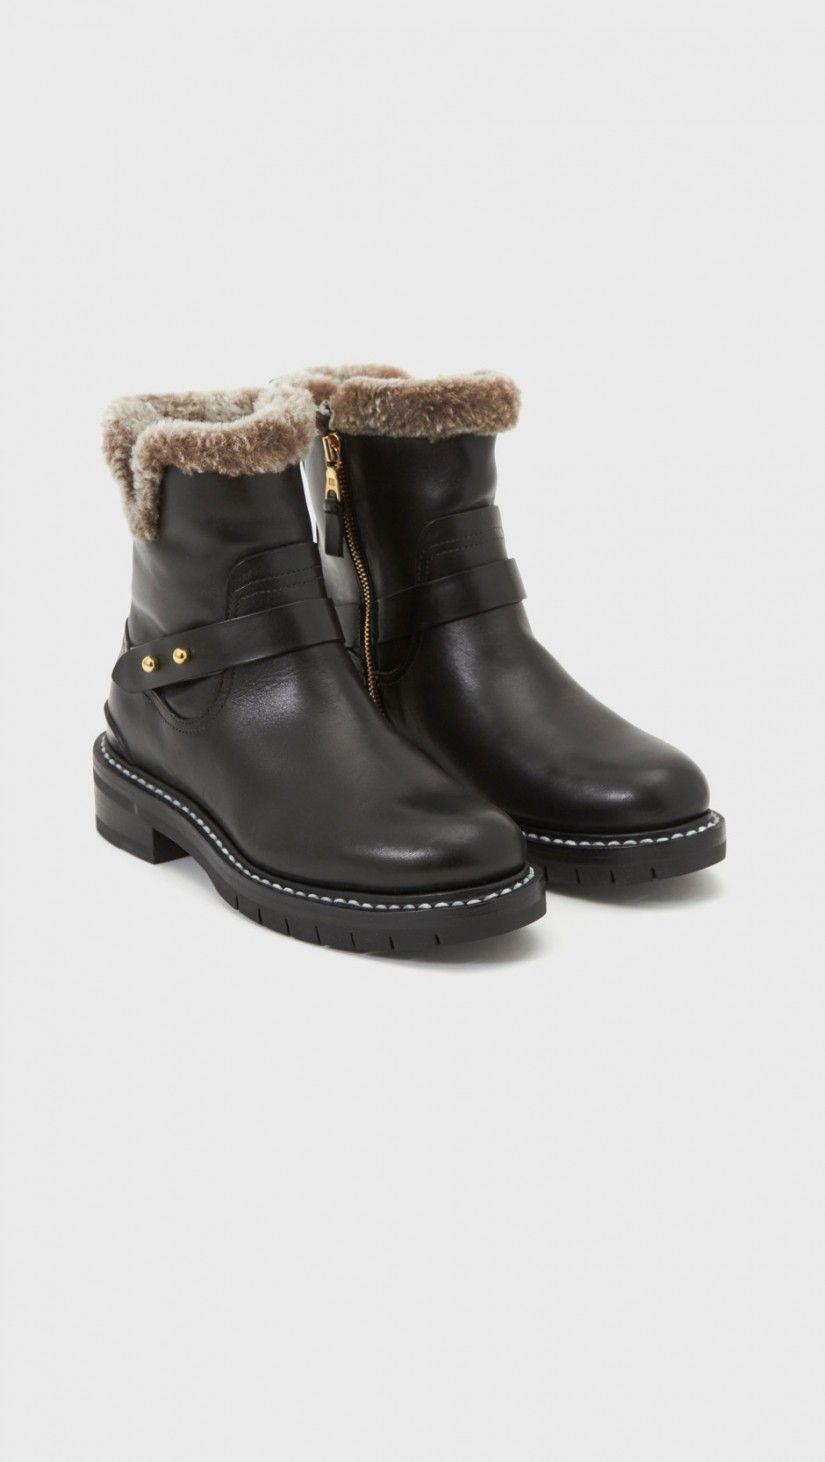 Rag & Bone Shearling Lined Ashford Moto Boots in Black | The Dreslyn